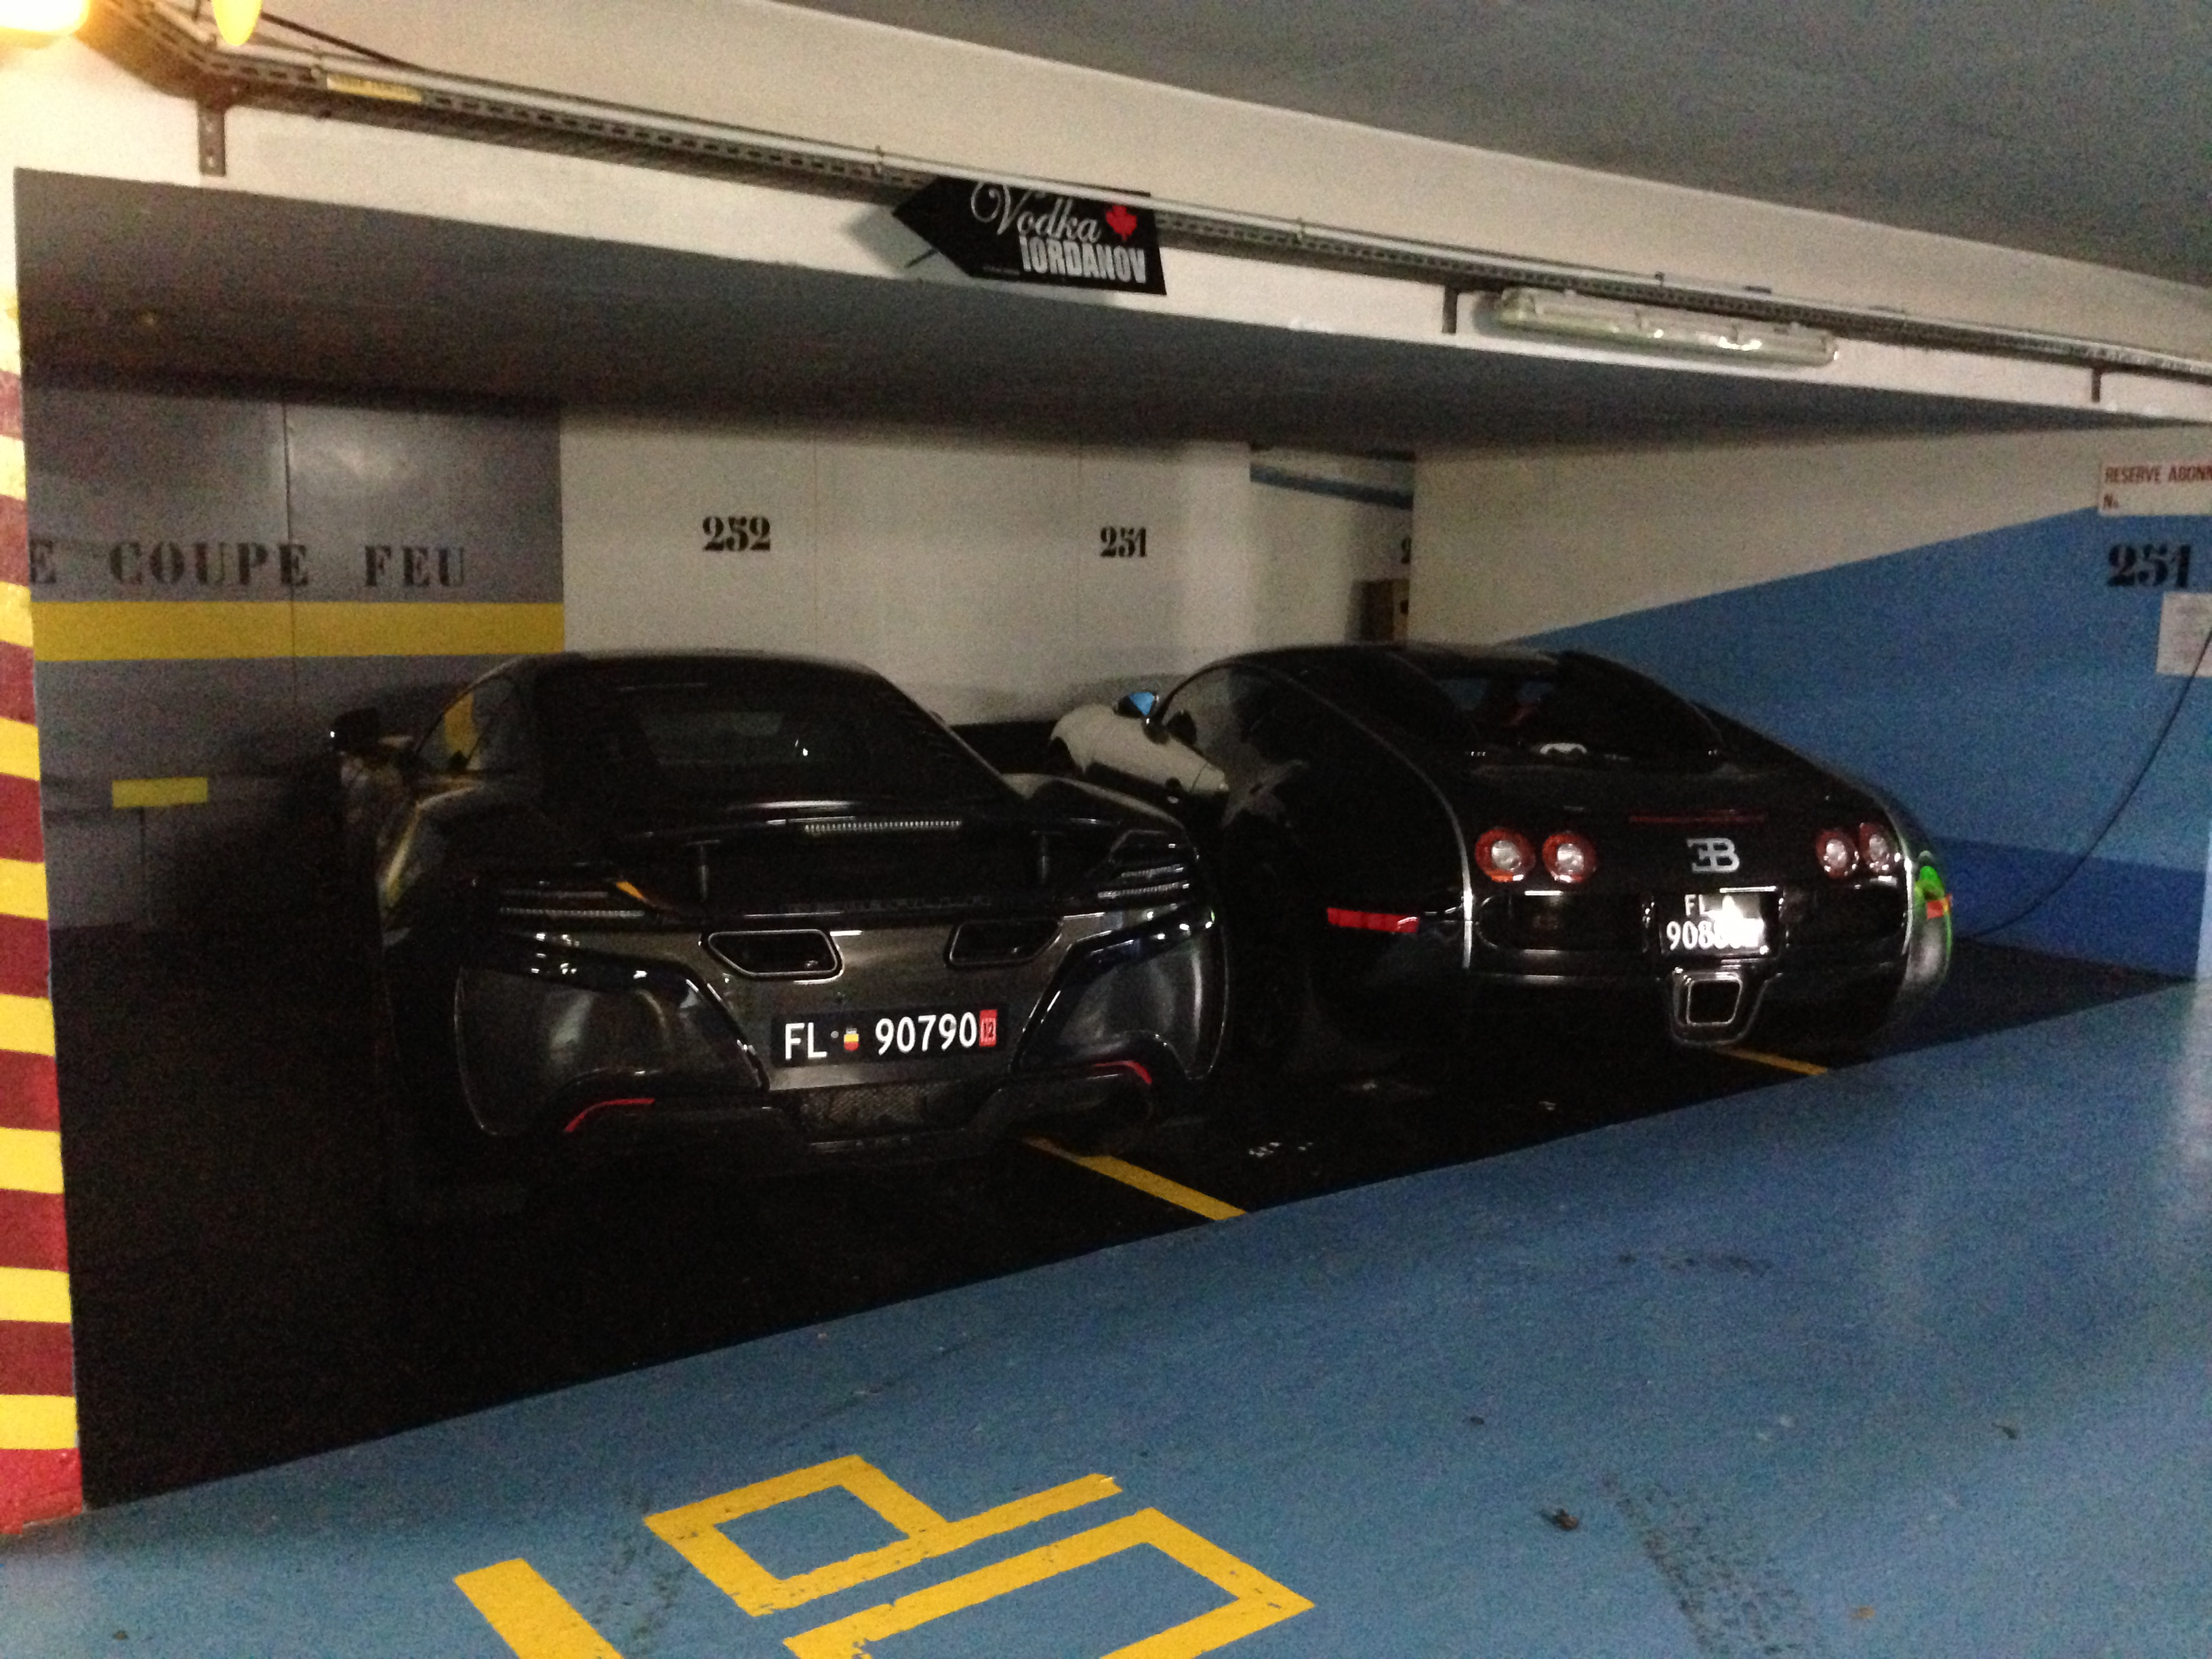 Monaco underground parking is lol... Can